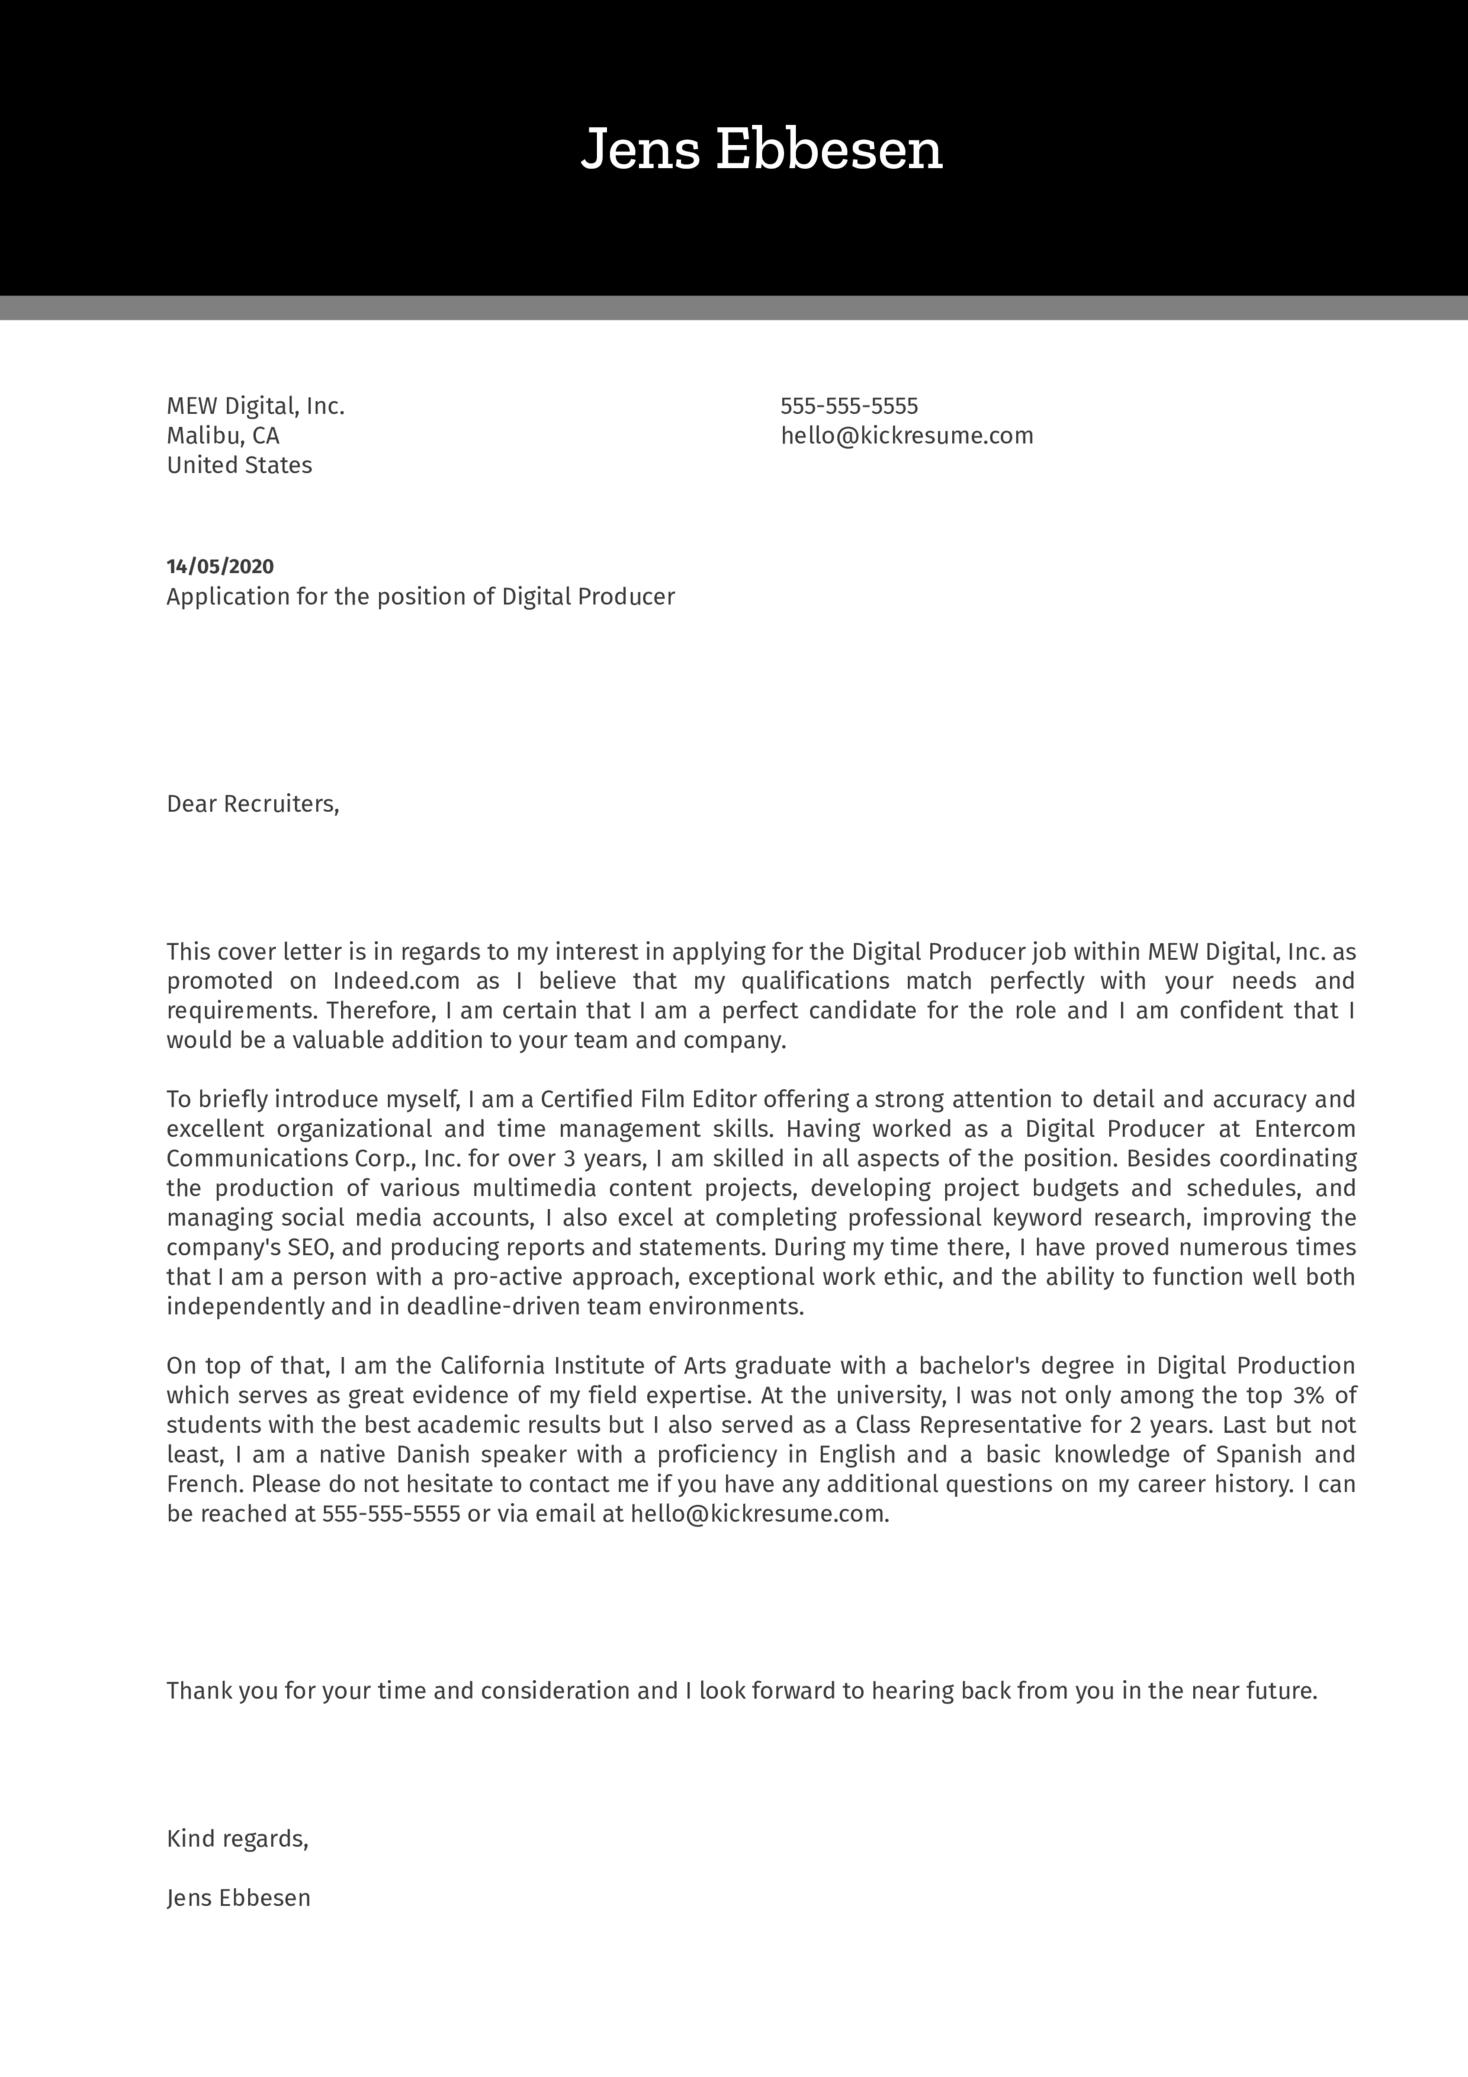 Digital Producer Cover Letter Sample Kickresume